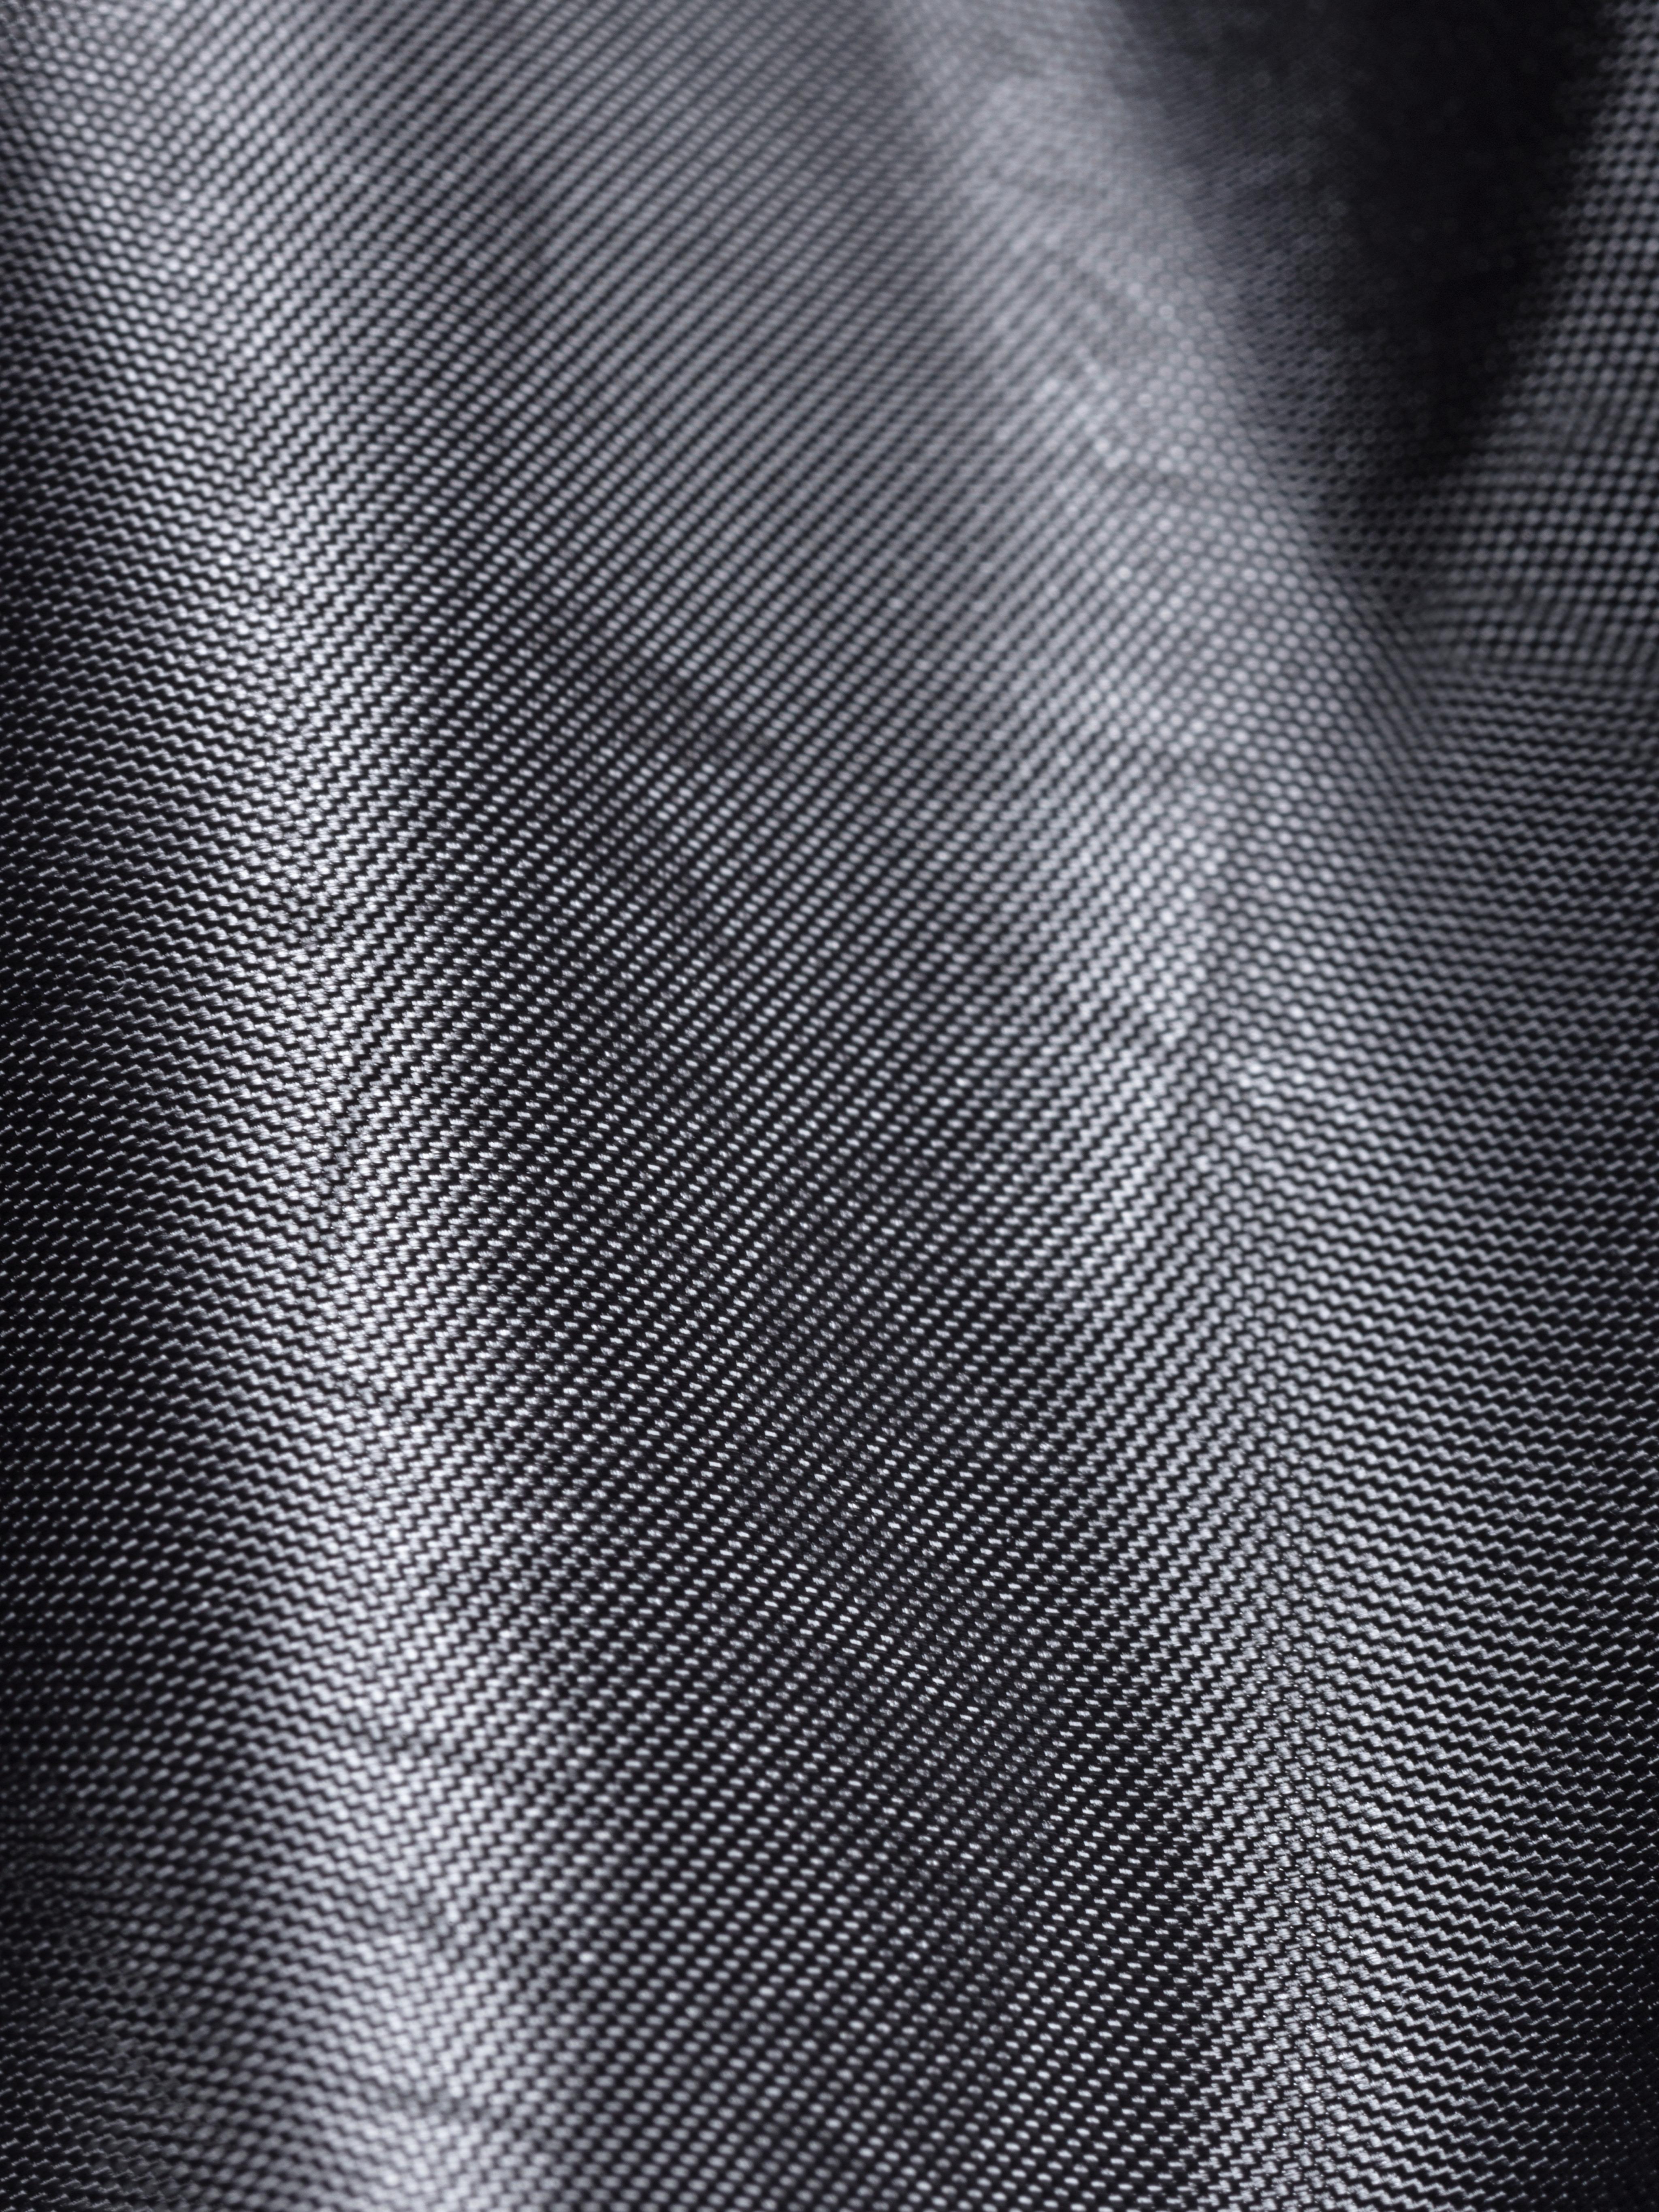 Lithium Crest product image